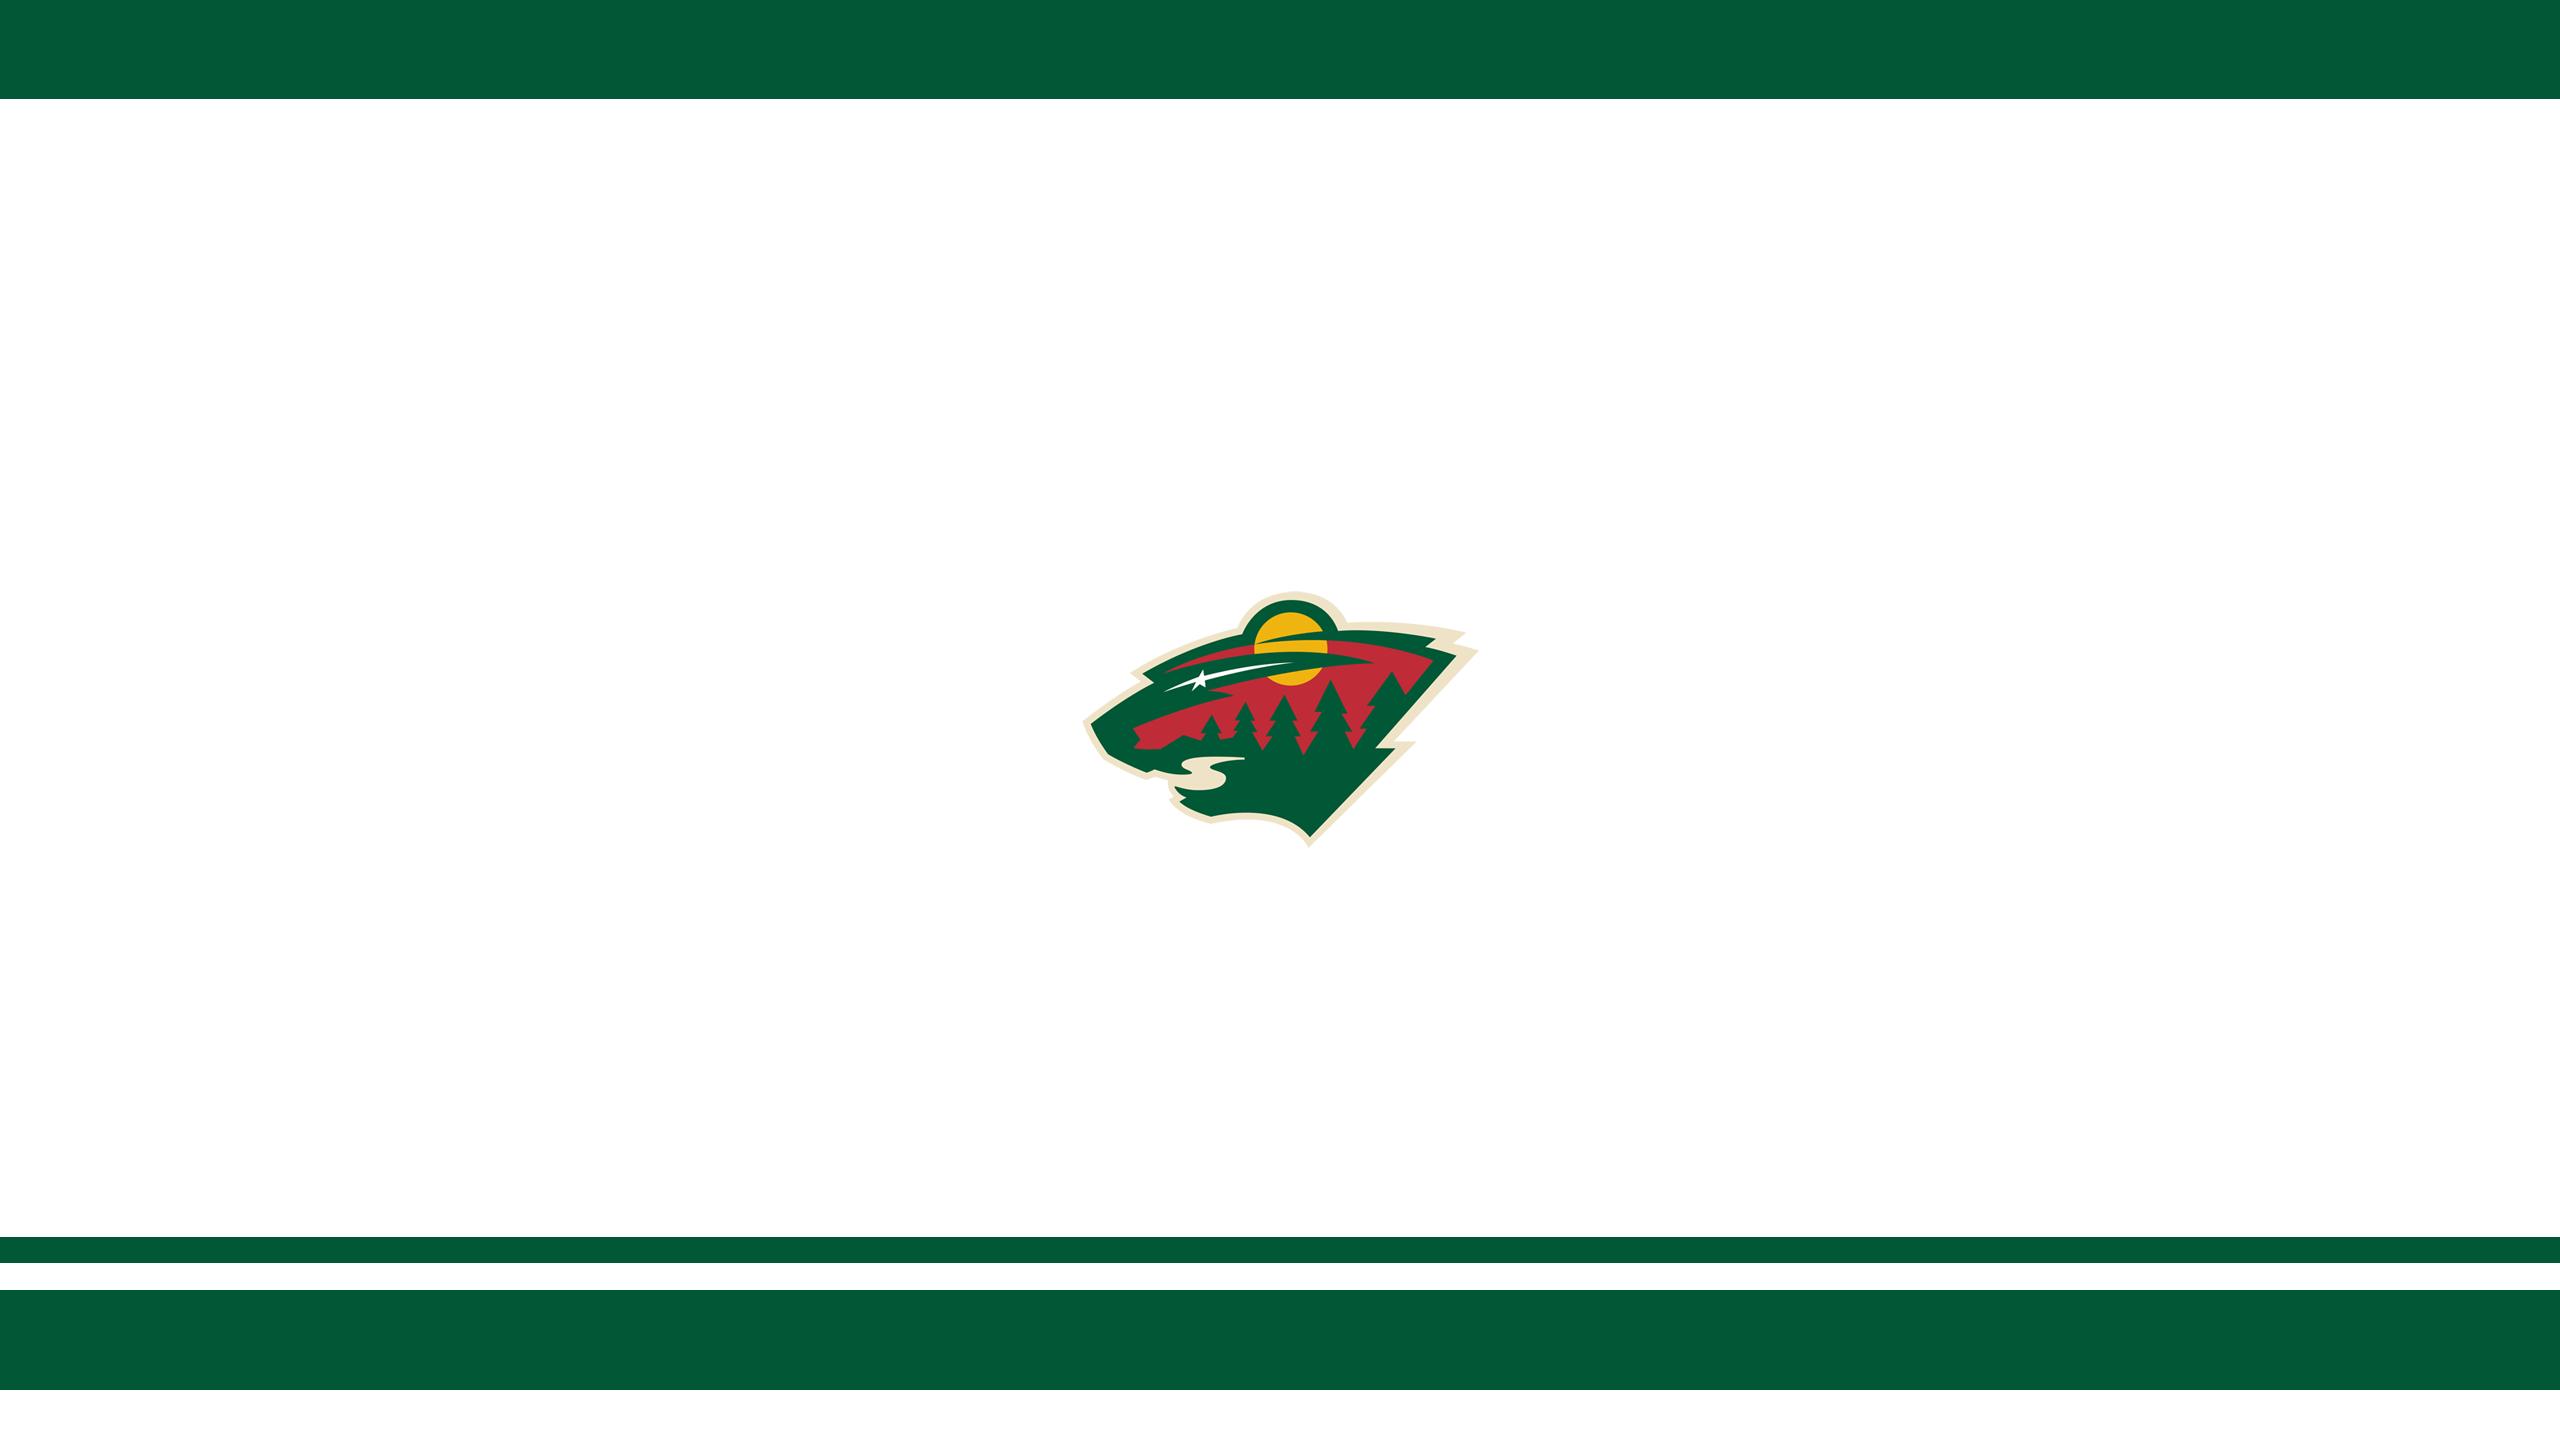 Minnesota Wild (Away)